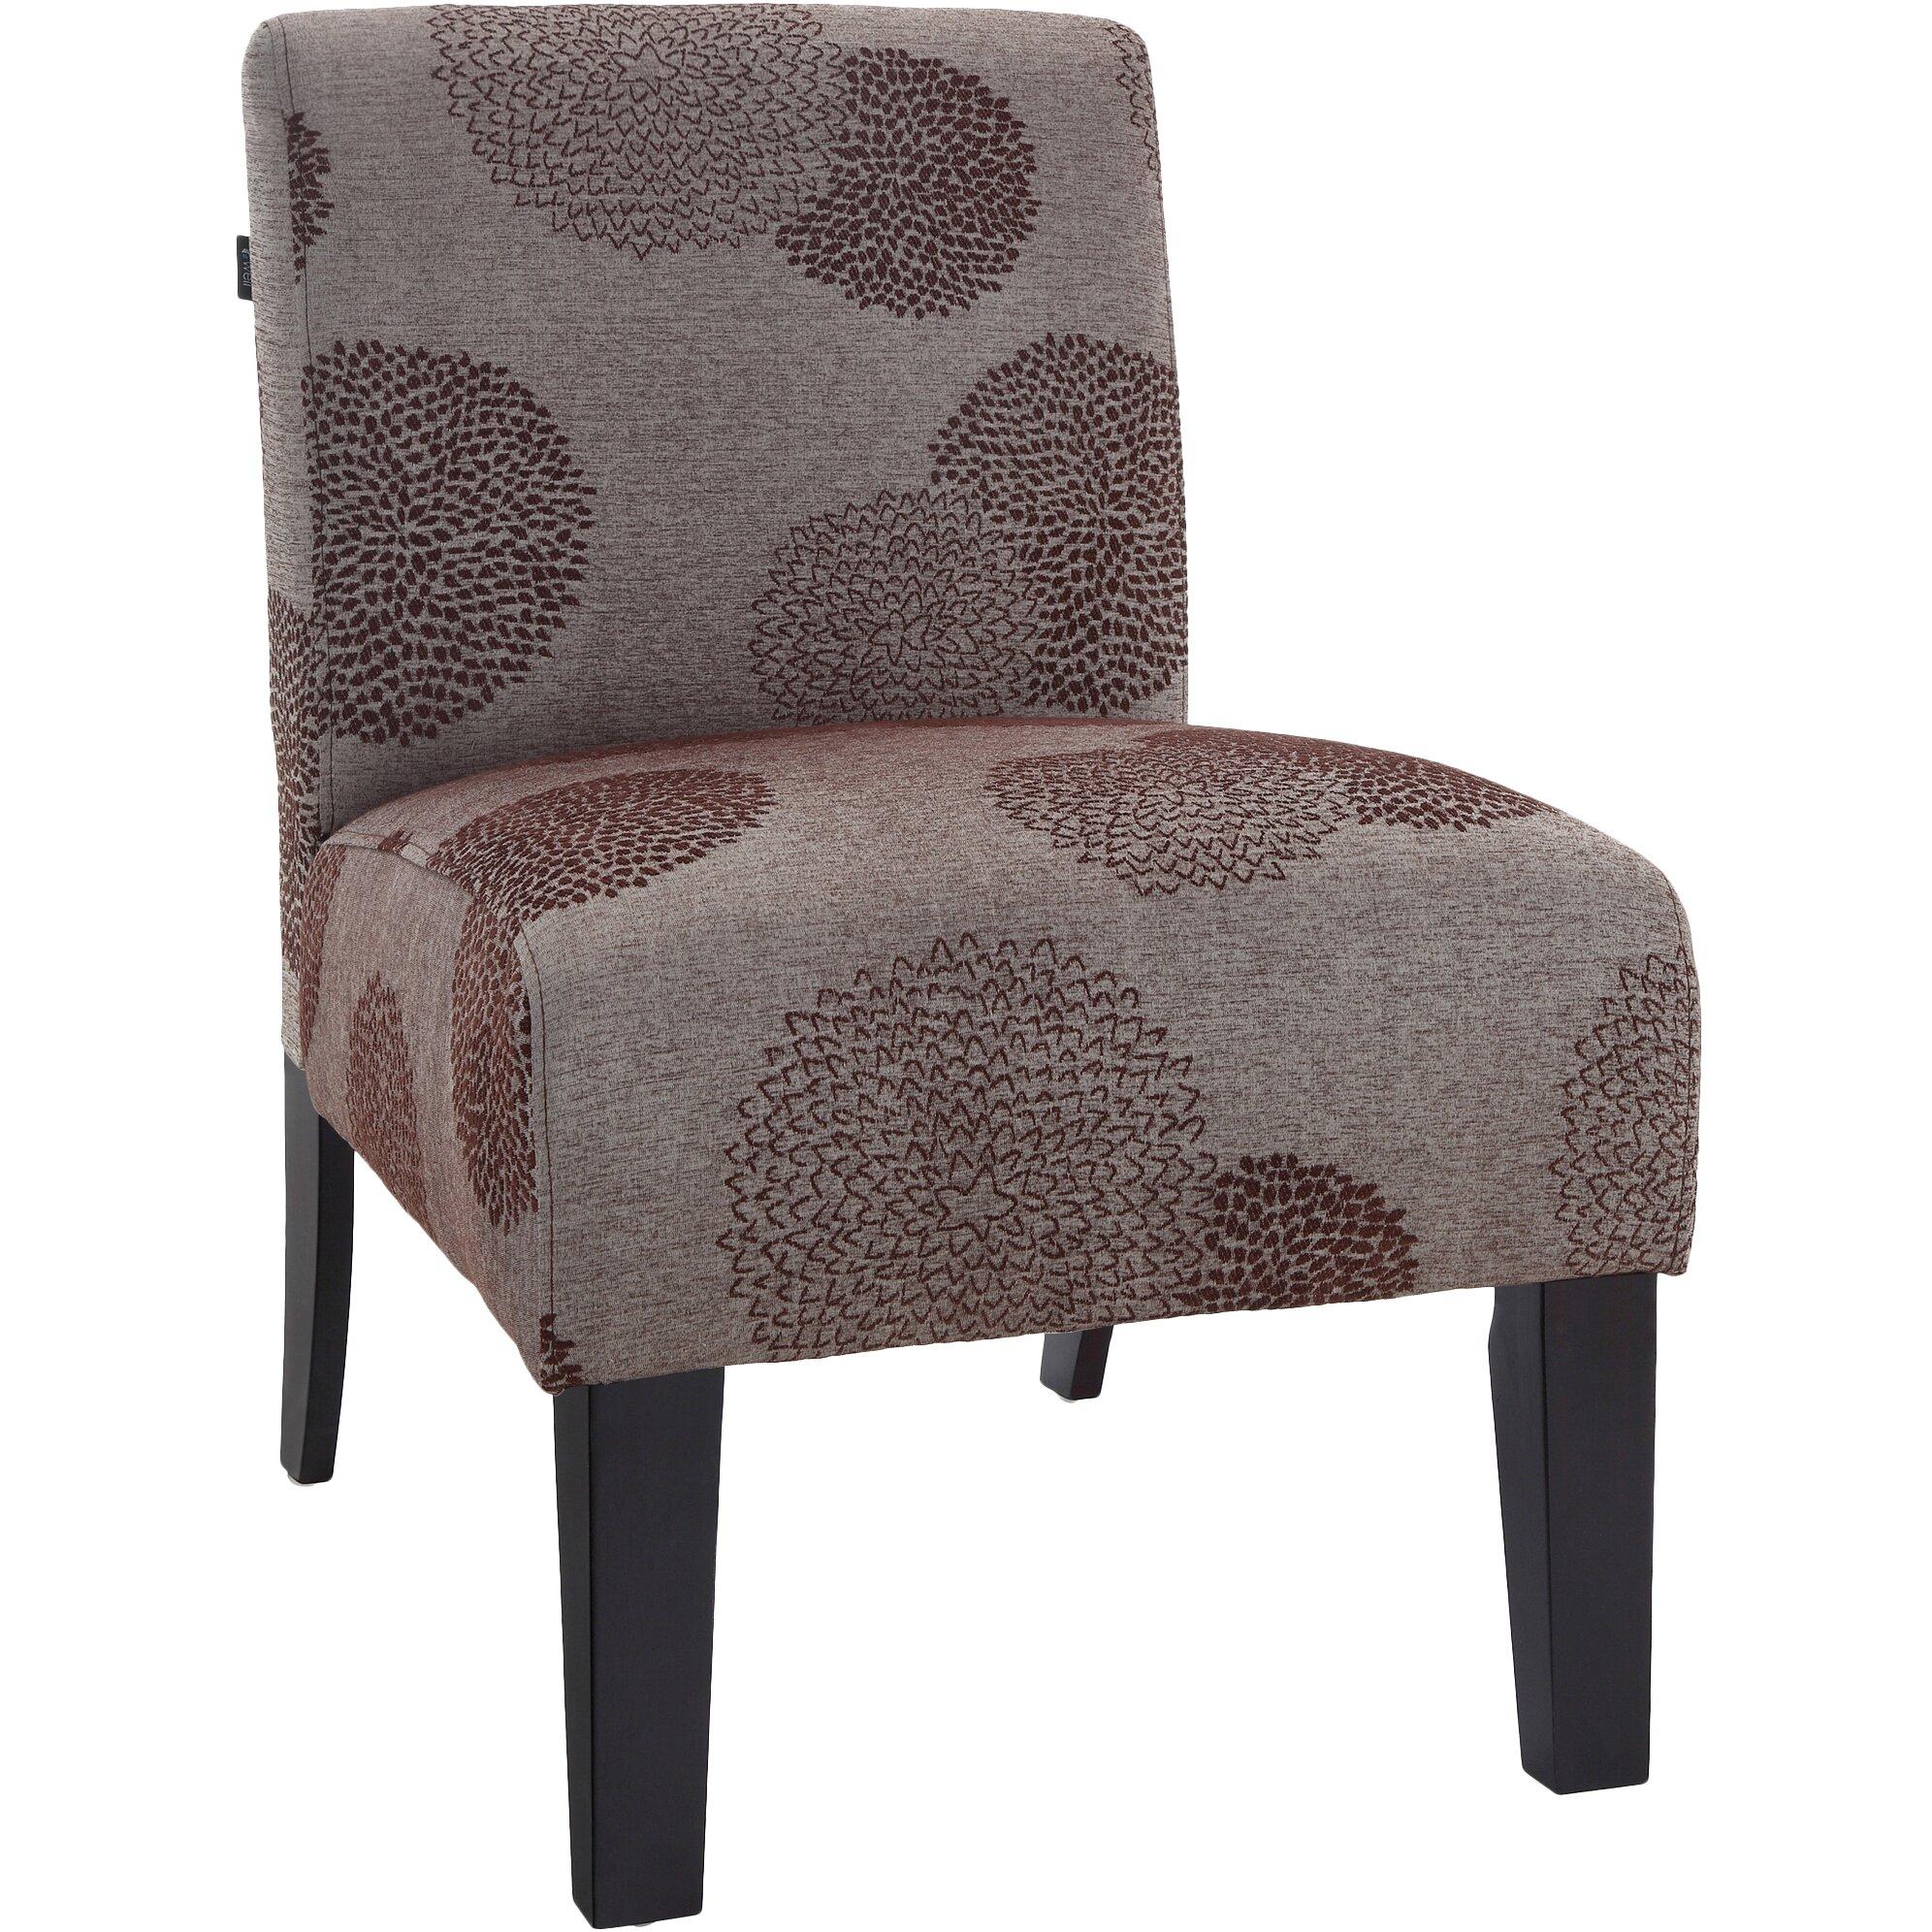 Andover mills slipper chair reviews wayfair for Slipper chair